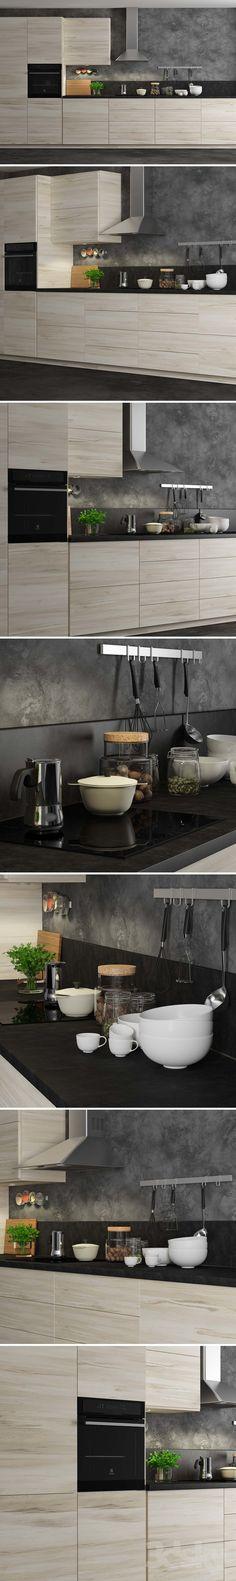 3d models: Kitchen - Kitchen Ikea Method Askersund.